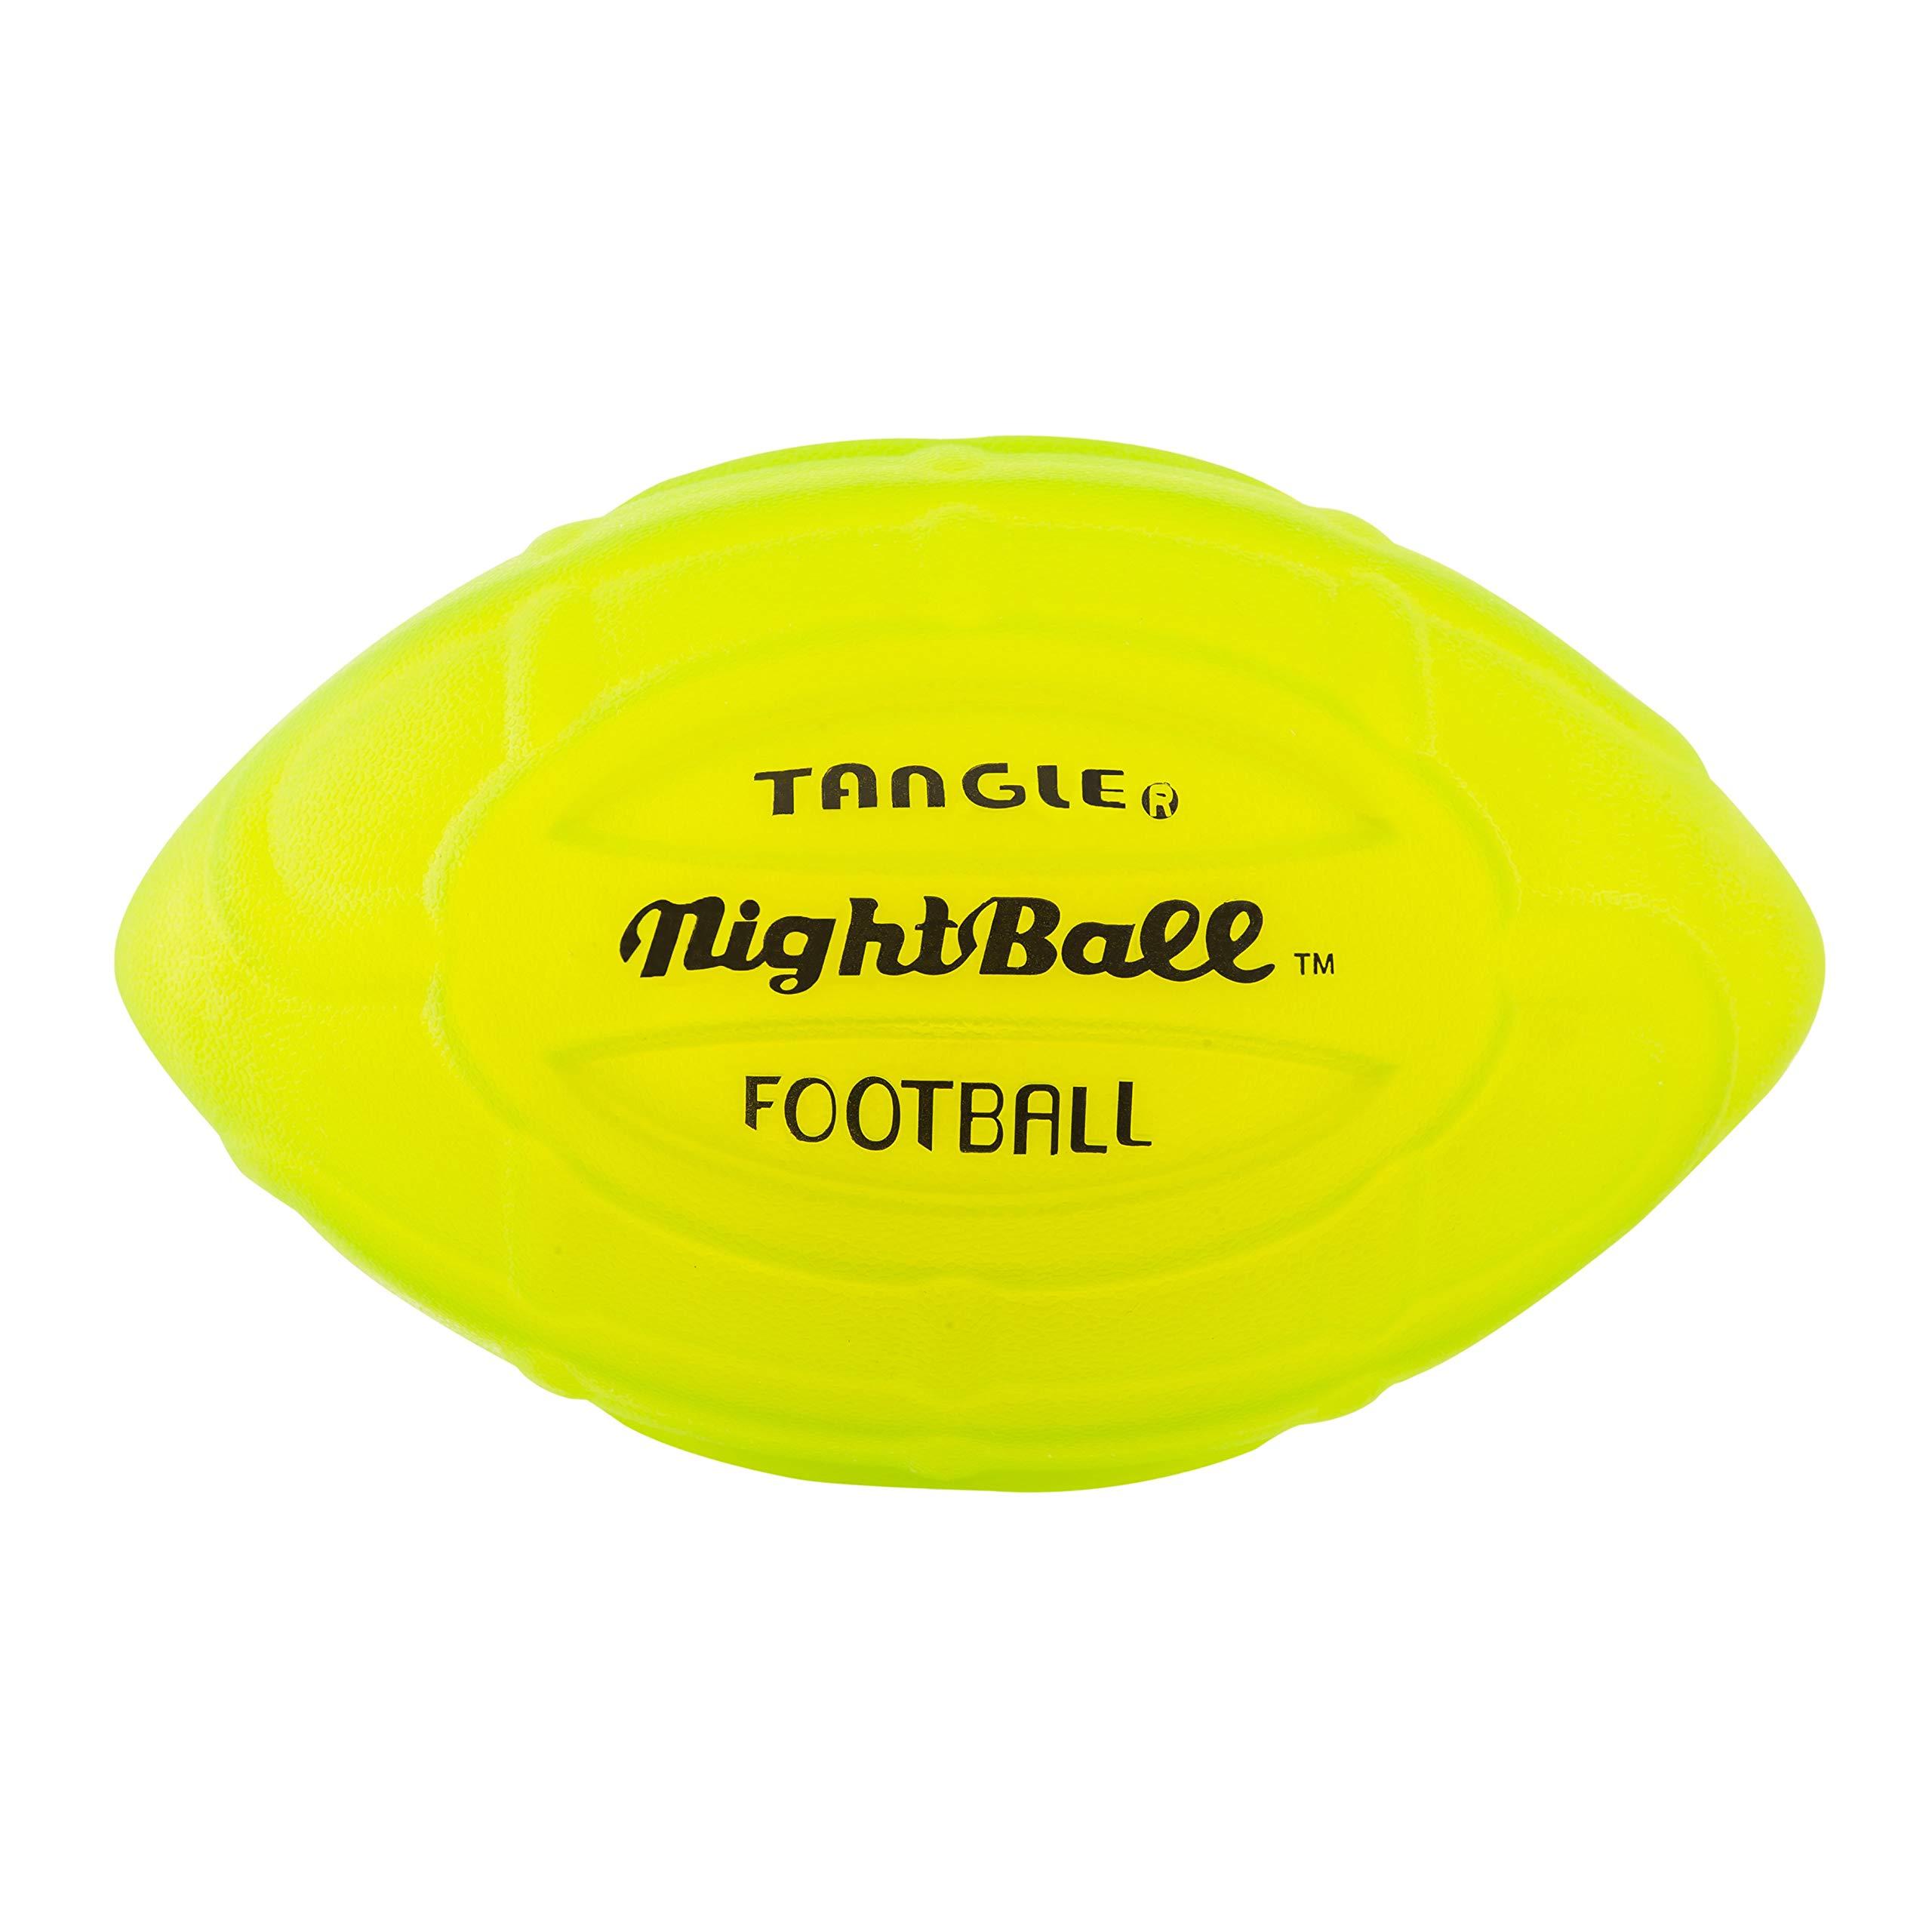 Tangle NightBall LED Light Up Football Green by Nightball